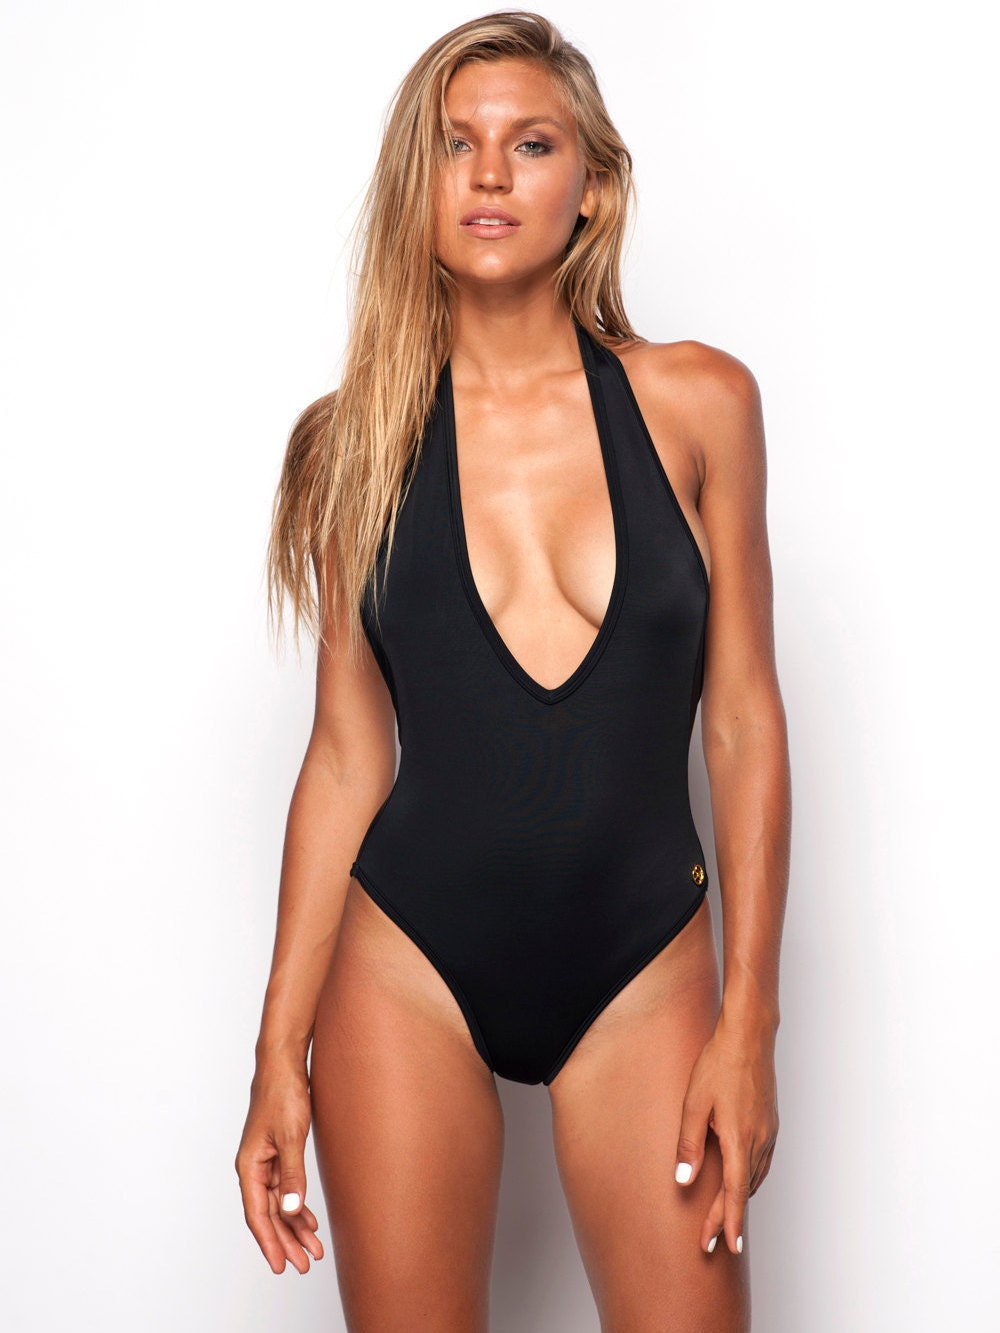 Bikini Celestia Vega nude (51 photos), Sexy, Fappening, Instagram, lingerie 2018